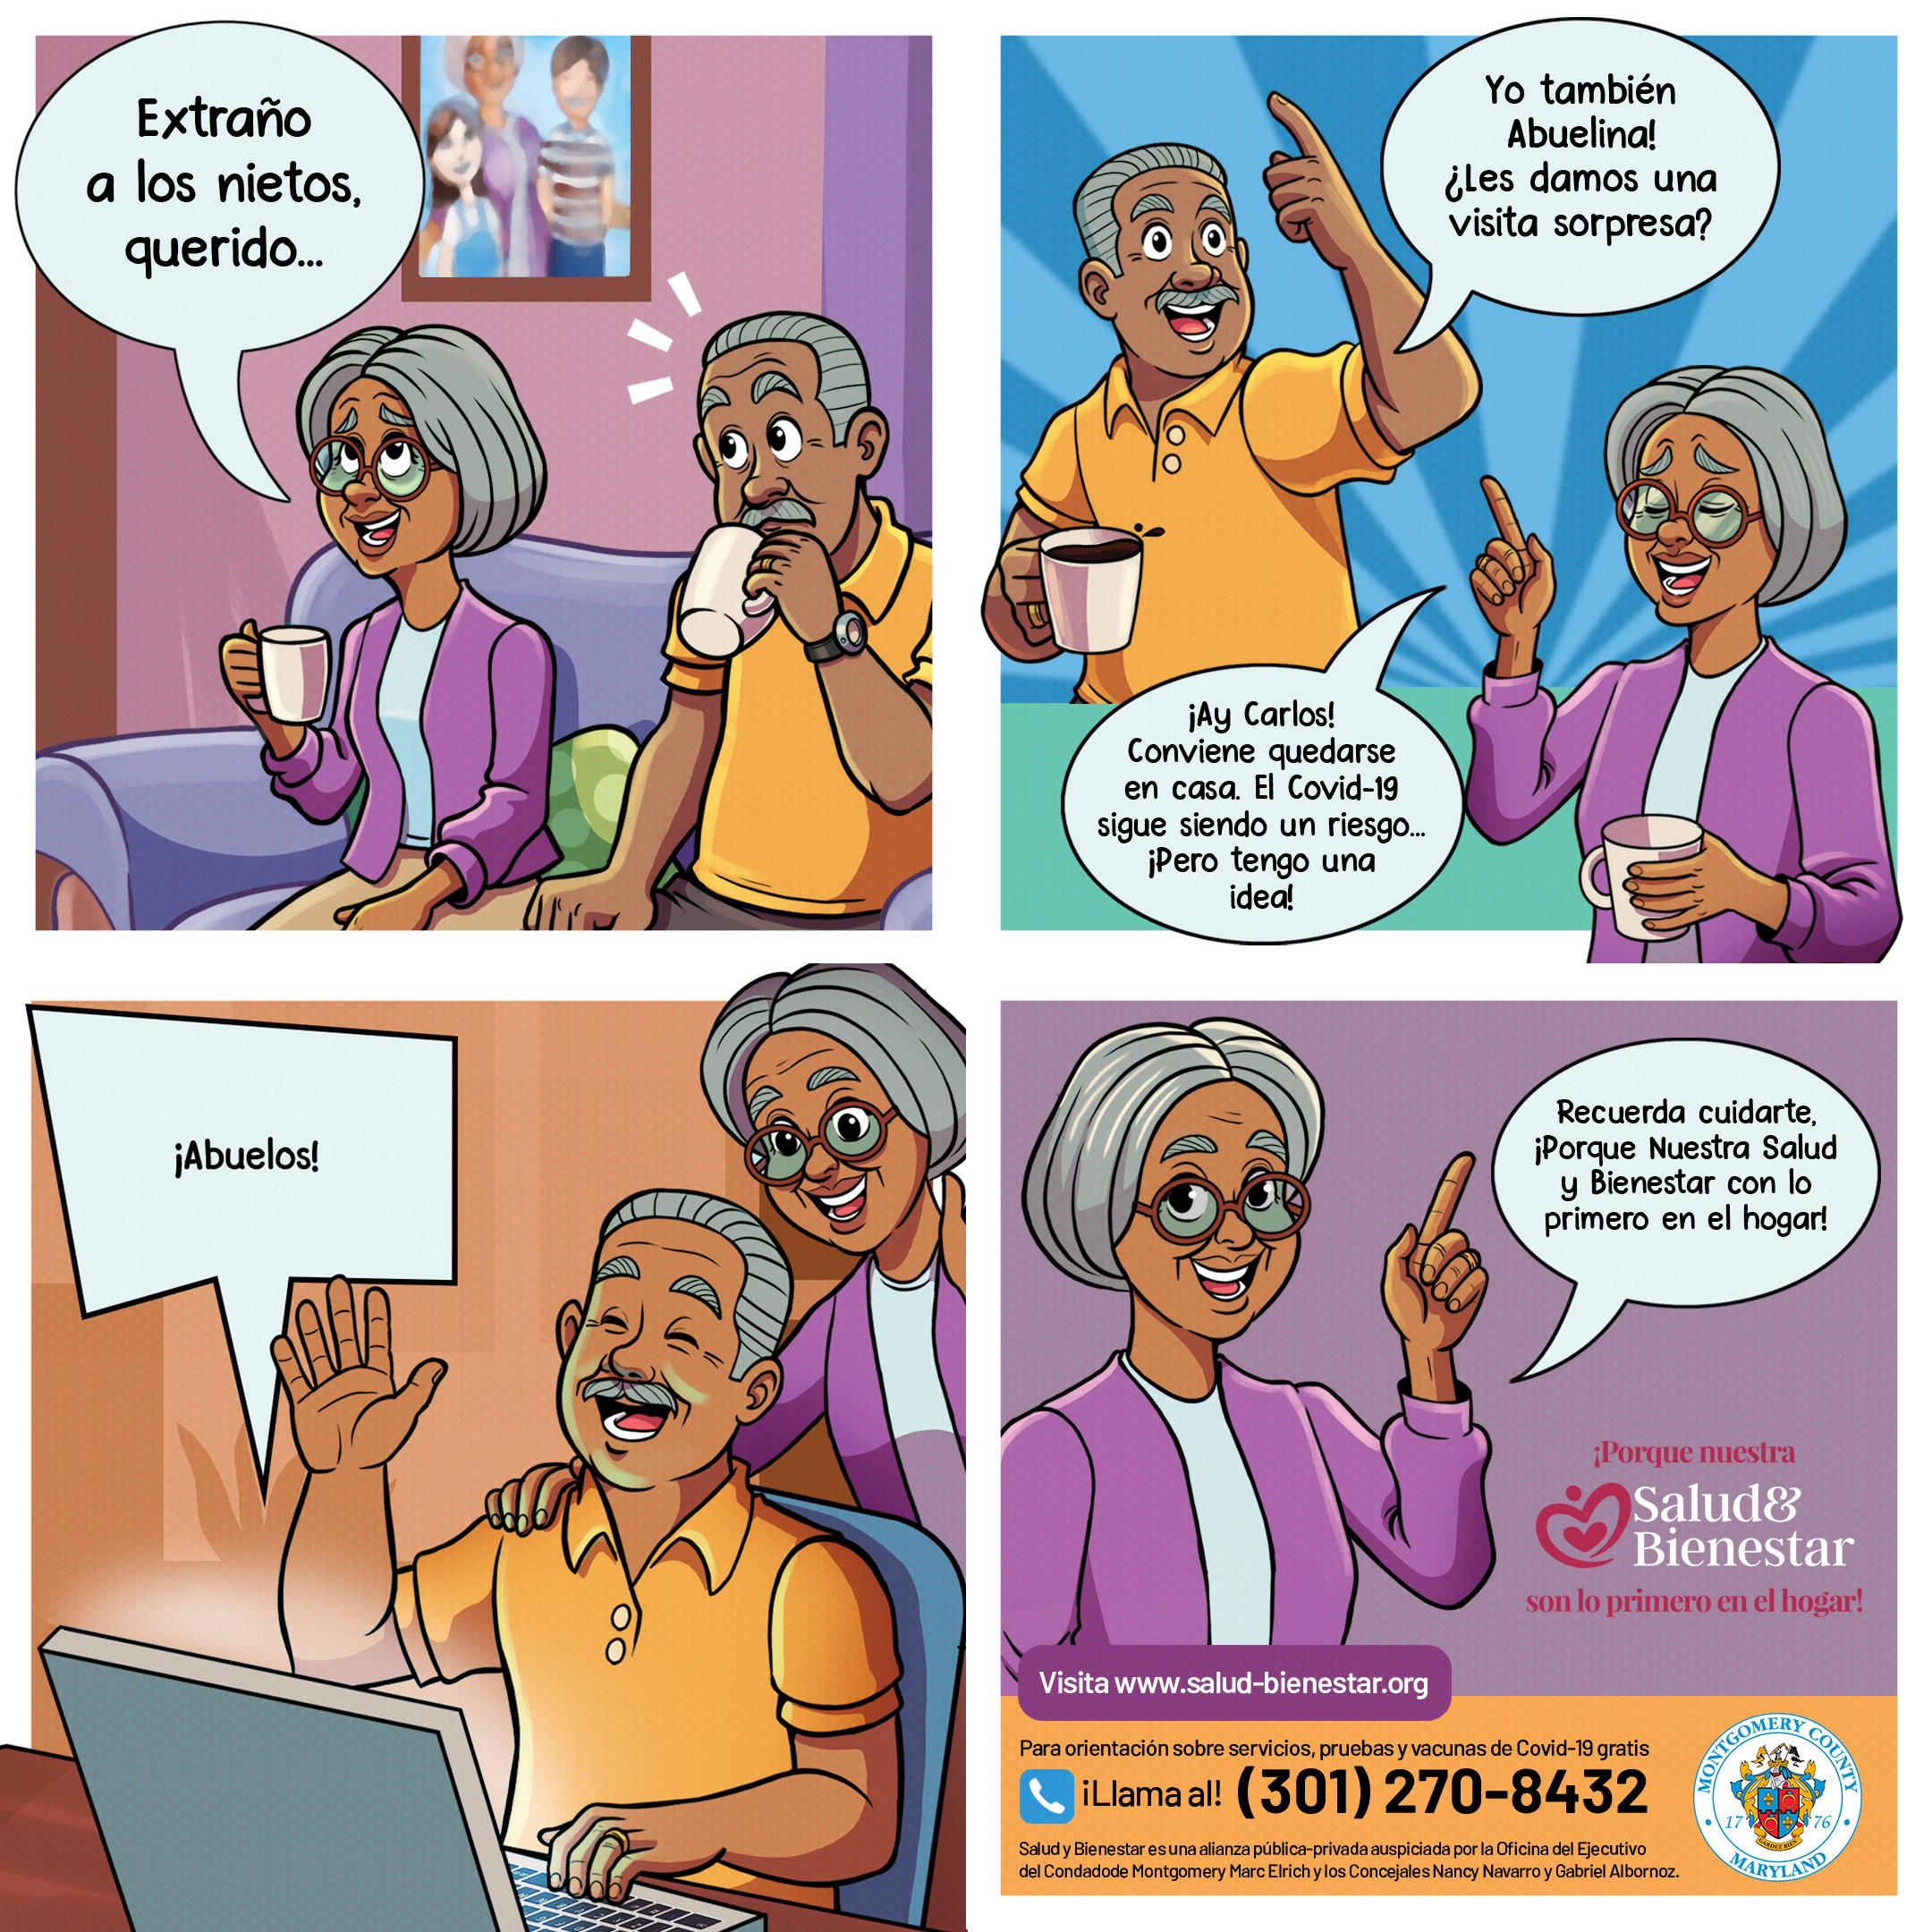 Salud y Bienestar - The Latino Health Initiative (LHI)